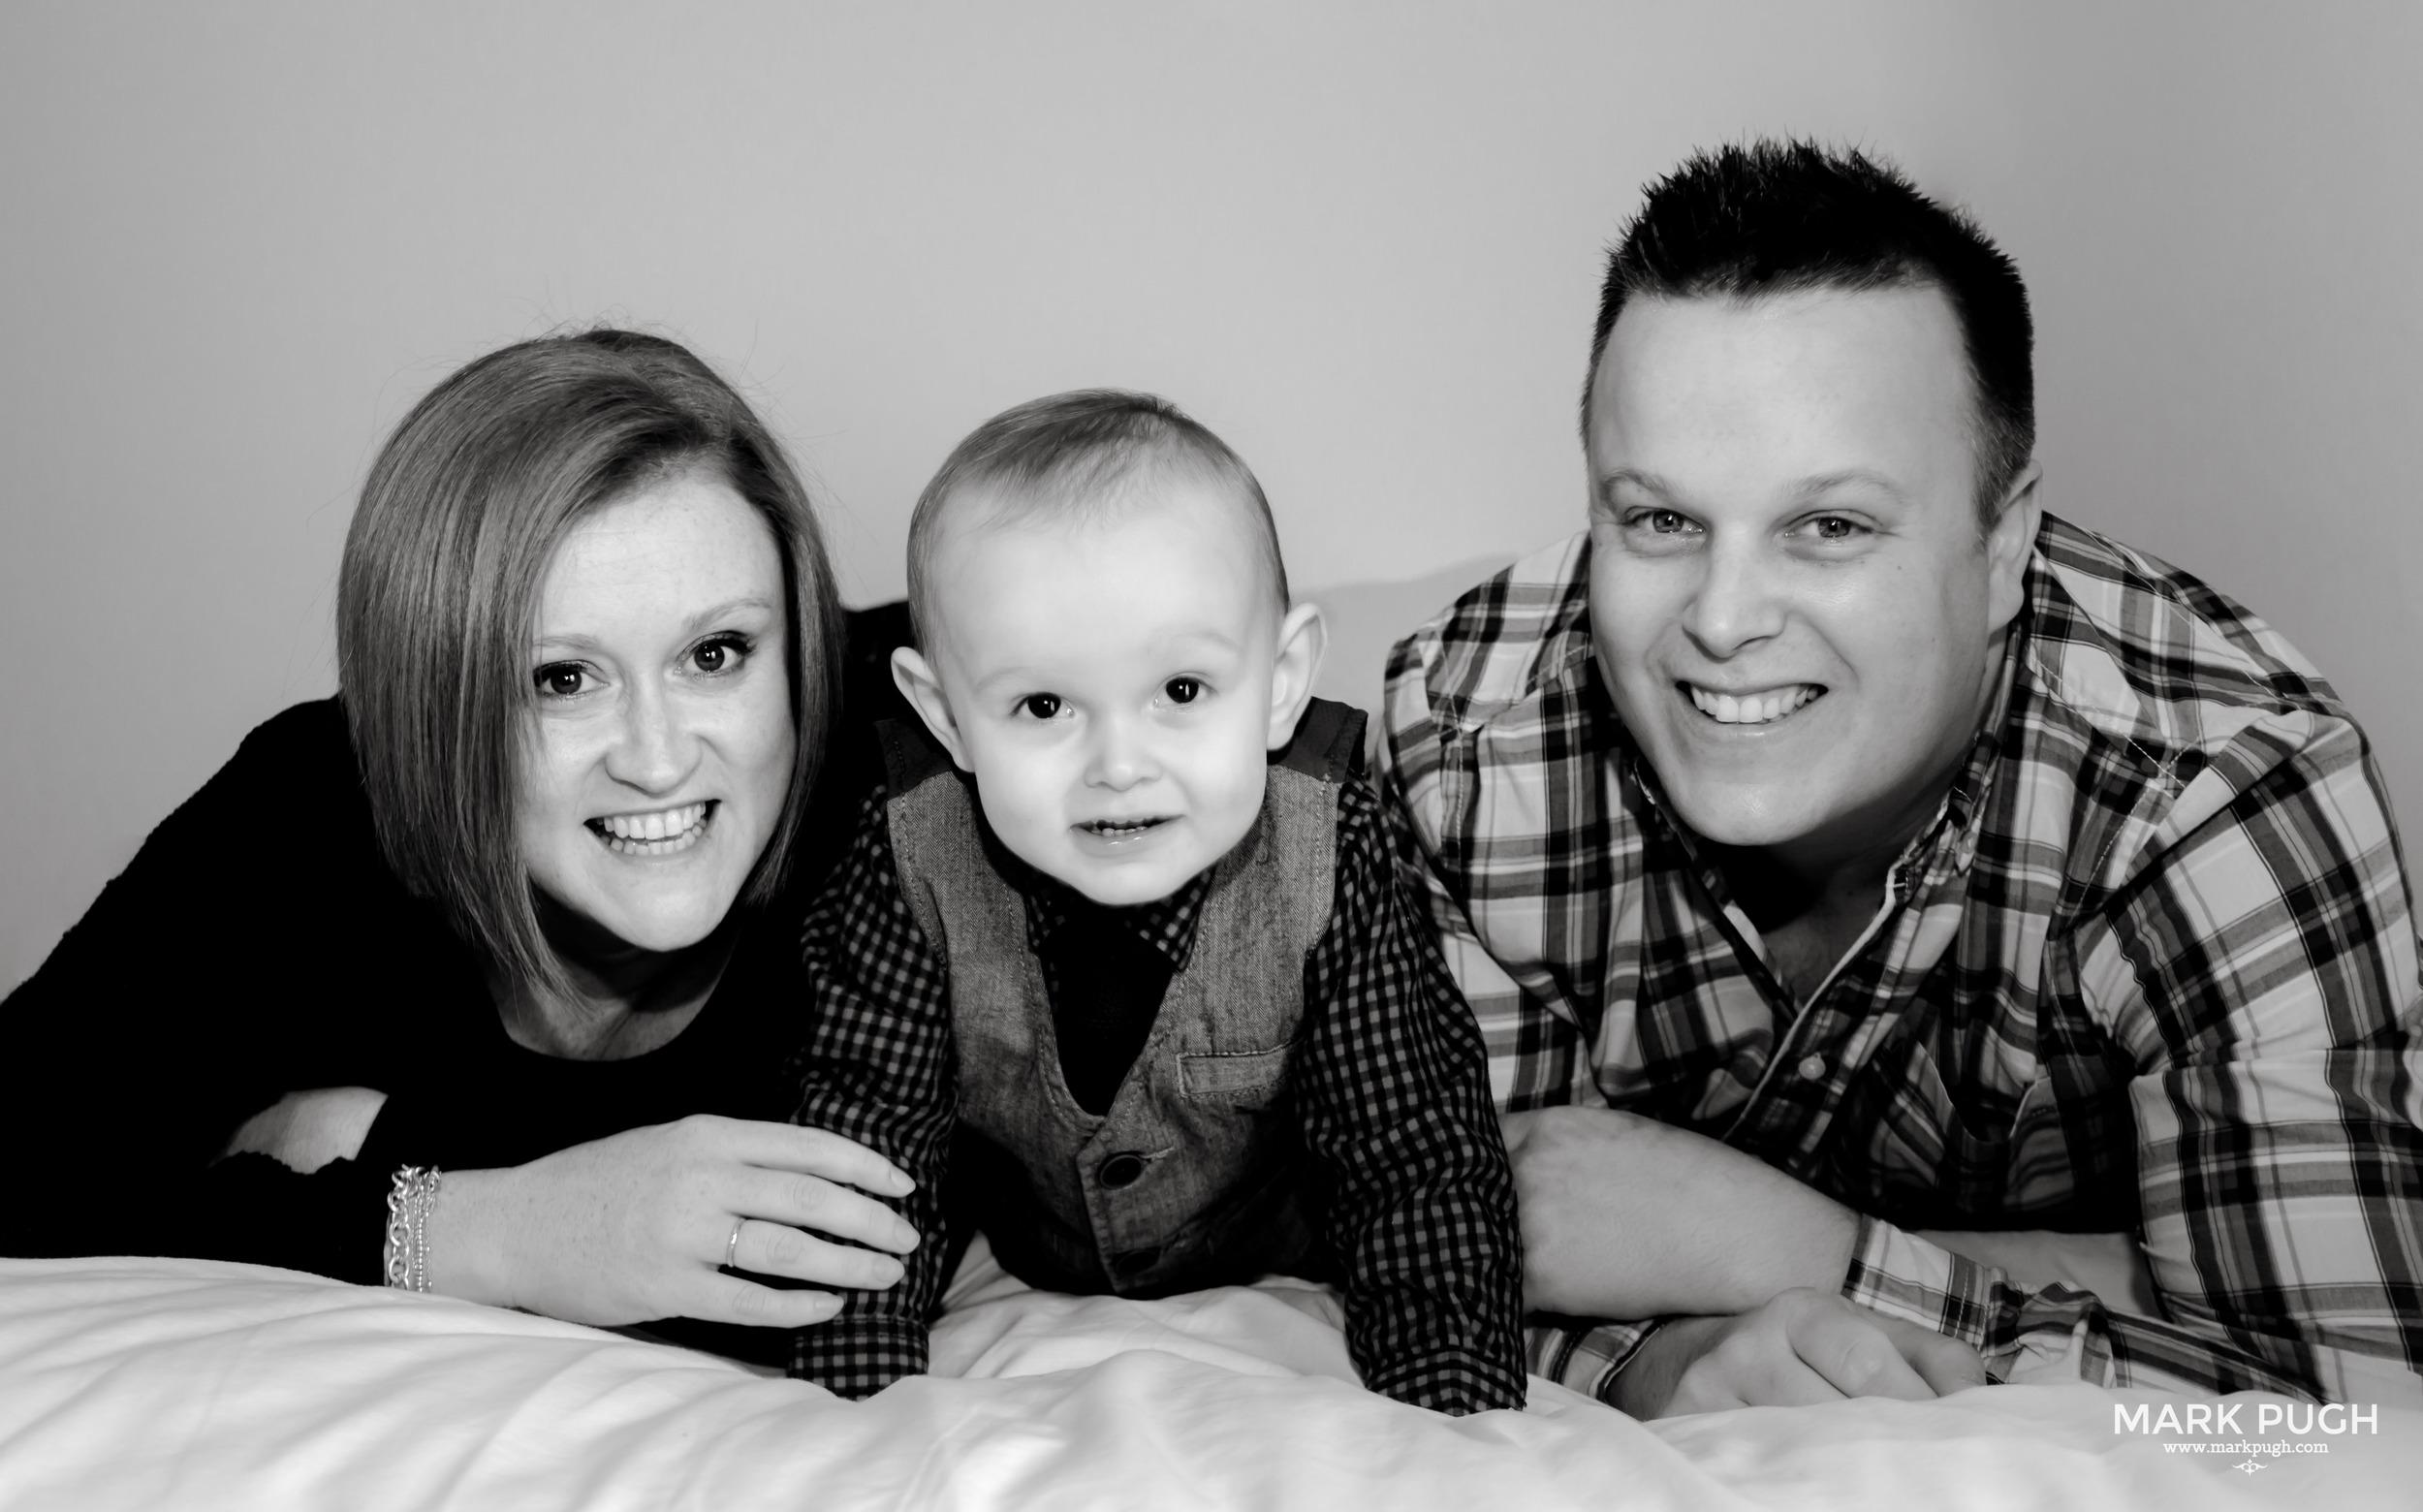 001 - Lisa Craig and Jackson - Family Photography by Mark Pugh www.markpugh.com.jpg